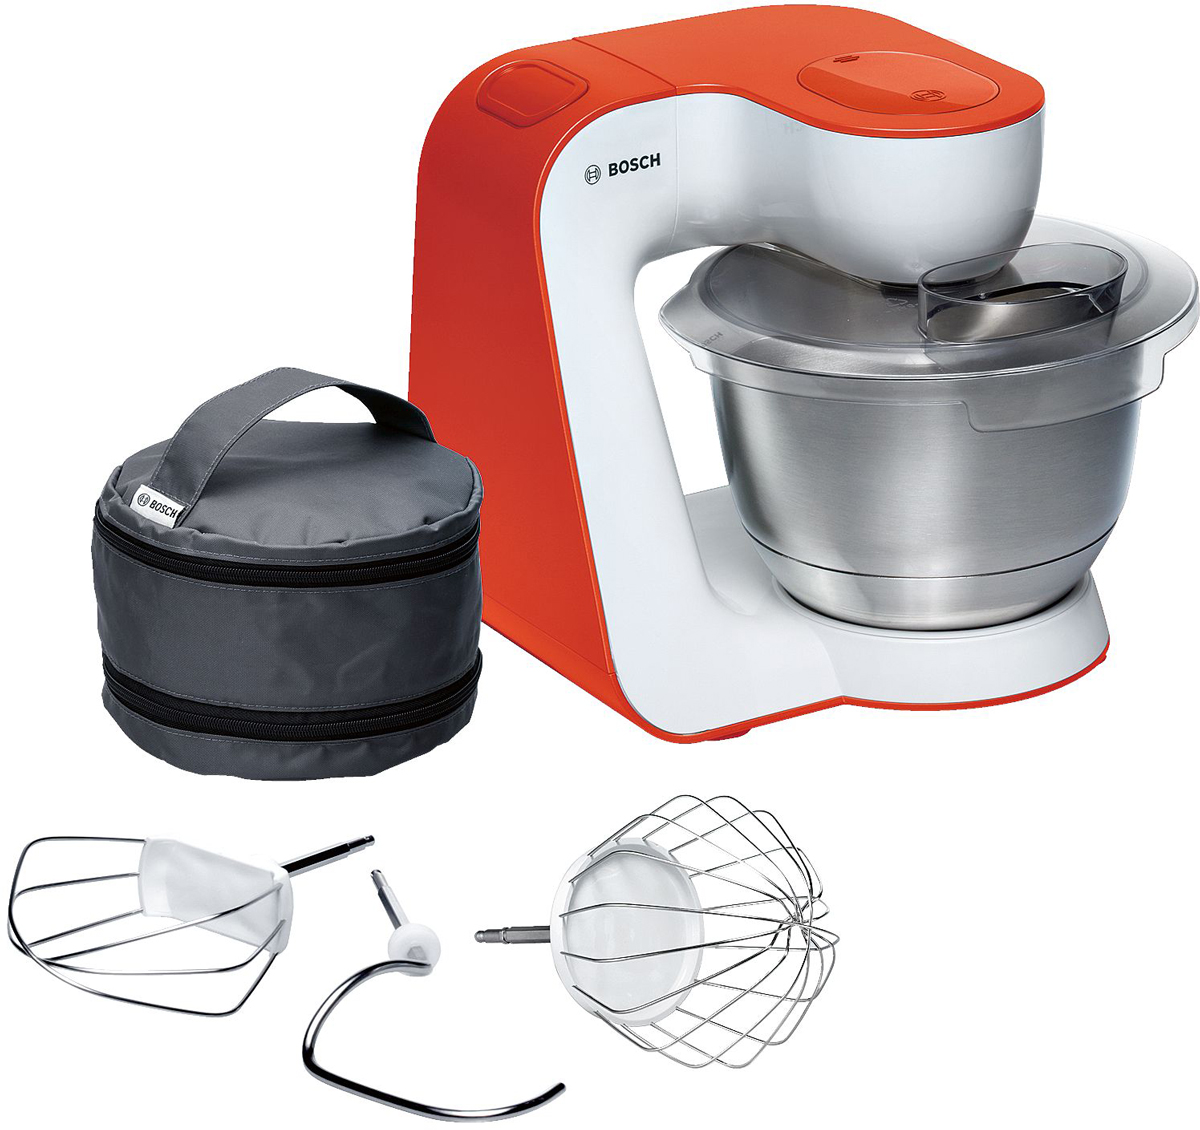 Bosch MUM54I00 кухонный комбайн - Комбайны и мясорубки